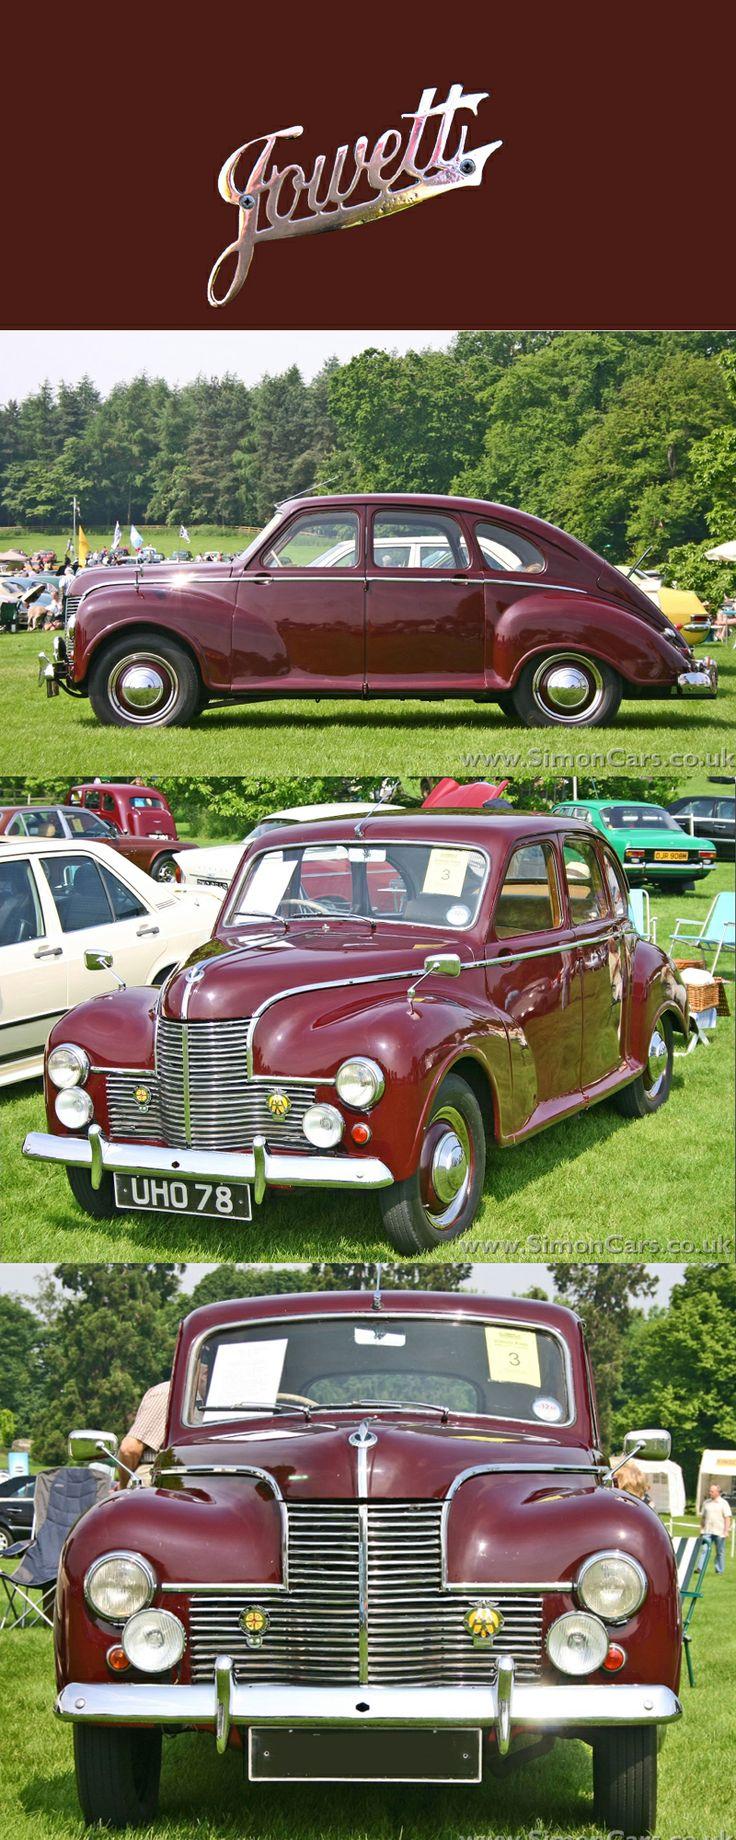 181 best Classic Cars images on Pinterest | Vintage cars, Antique ...